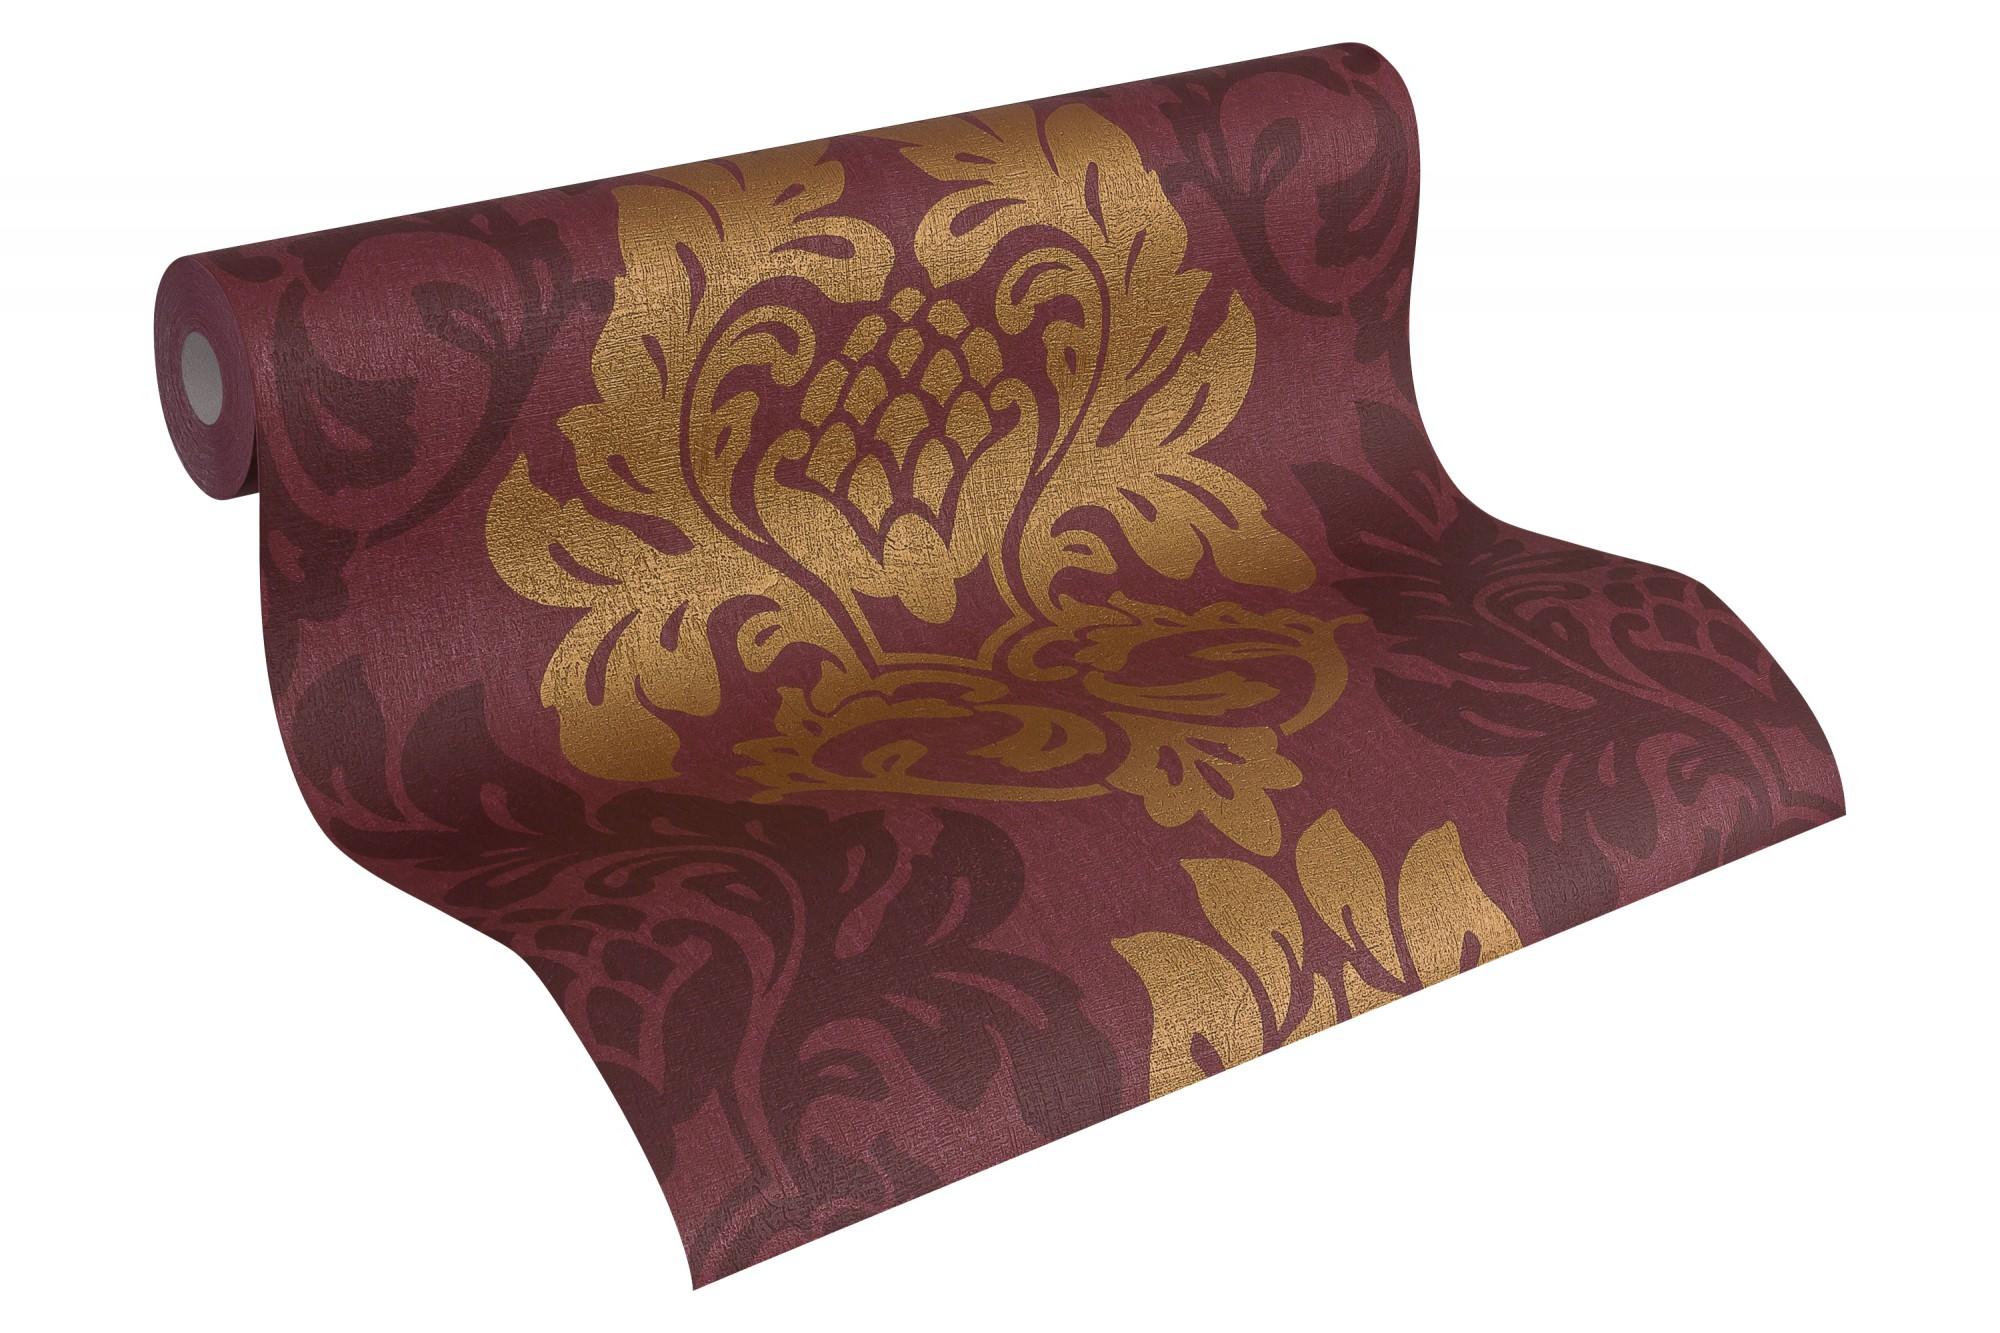 tapete vlies barock dunkelrot gold as fleece royal 96190 4 3 67 1qm ebay. Black Bedroom Furniture Sets. Home Design Ideas